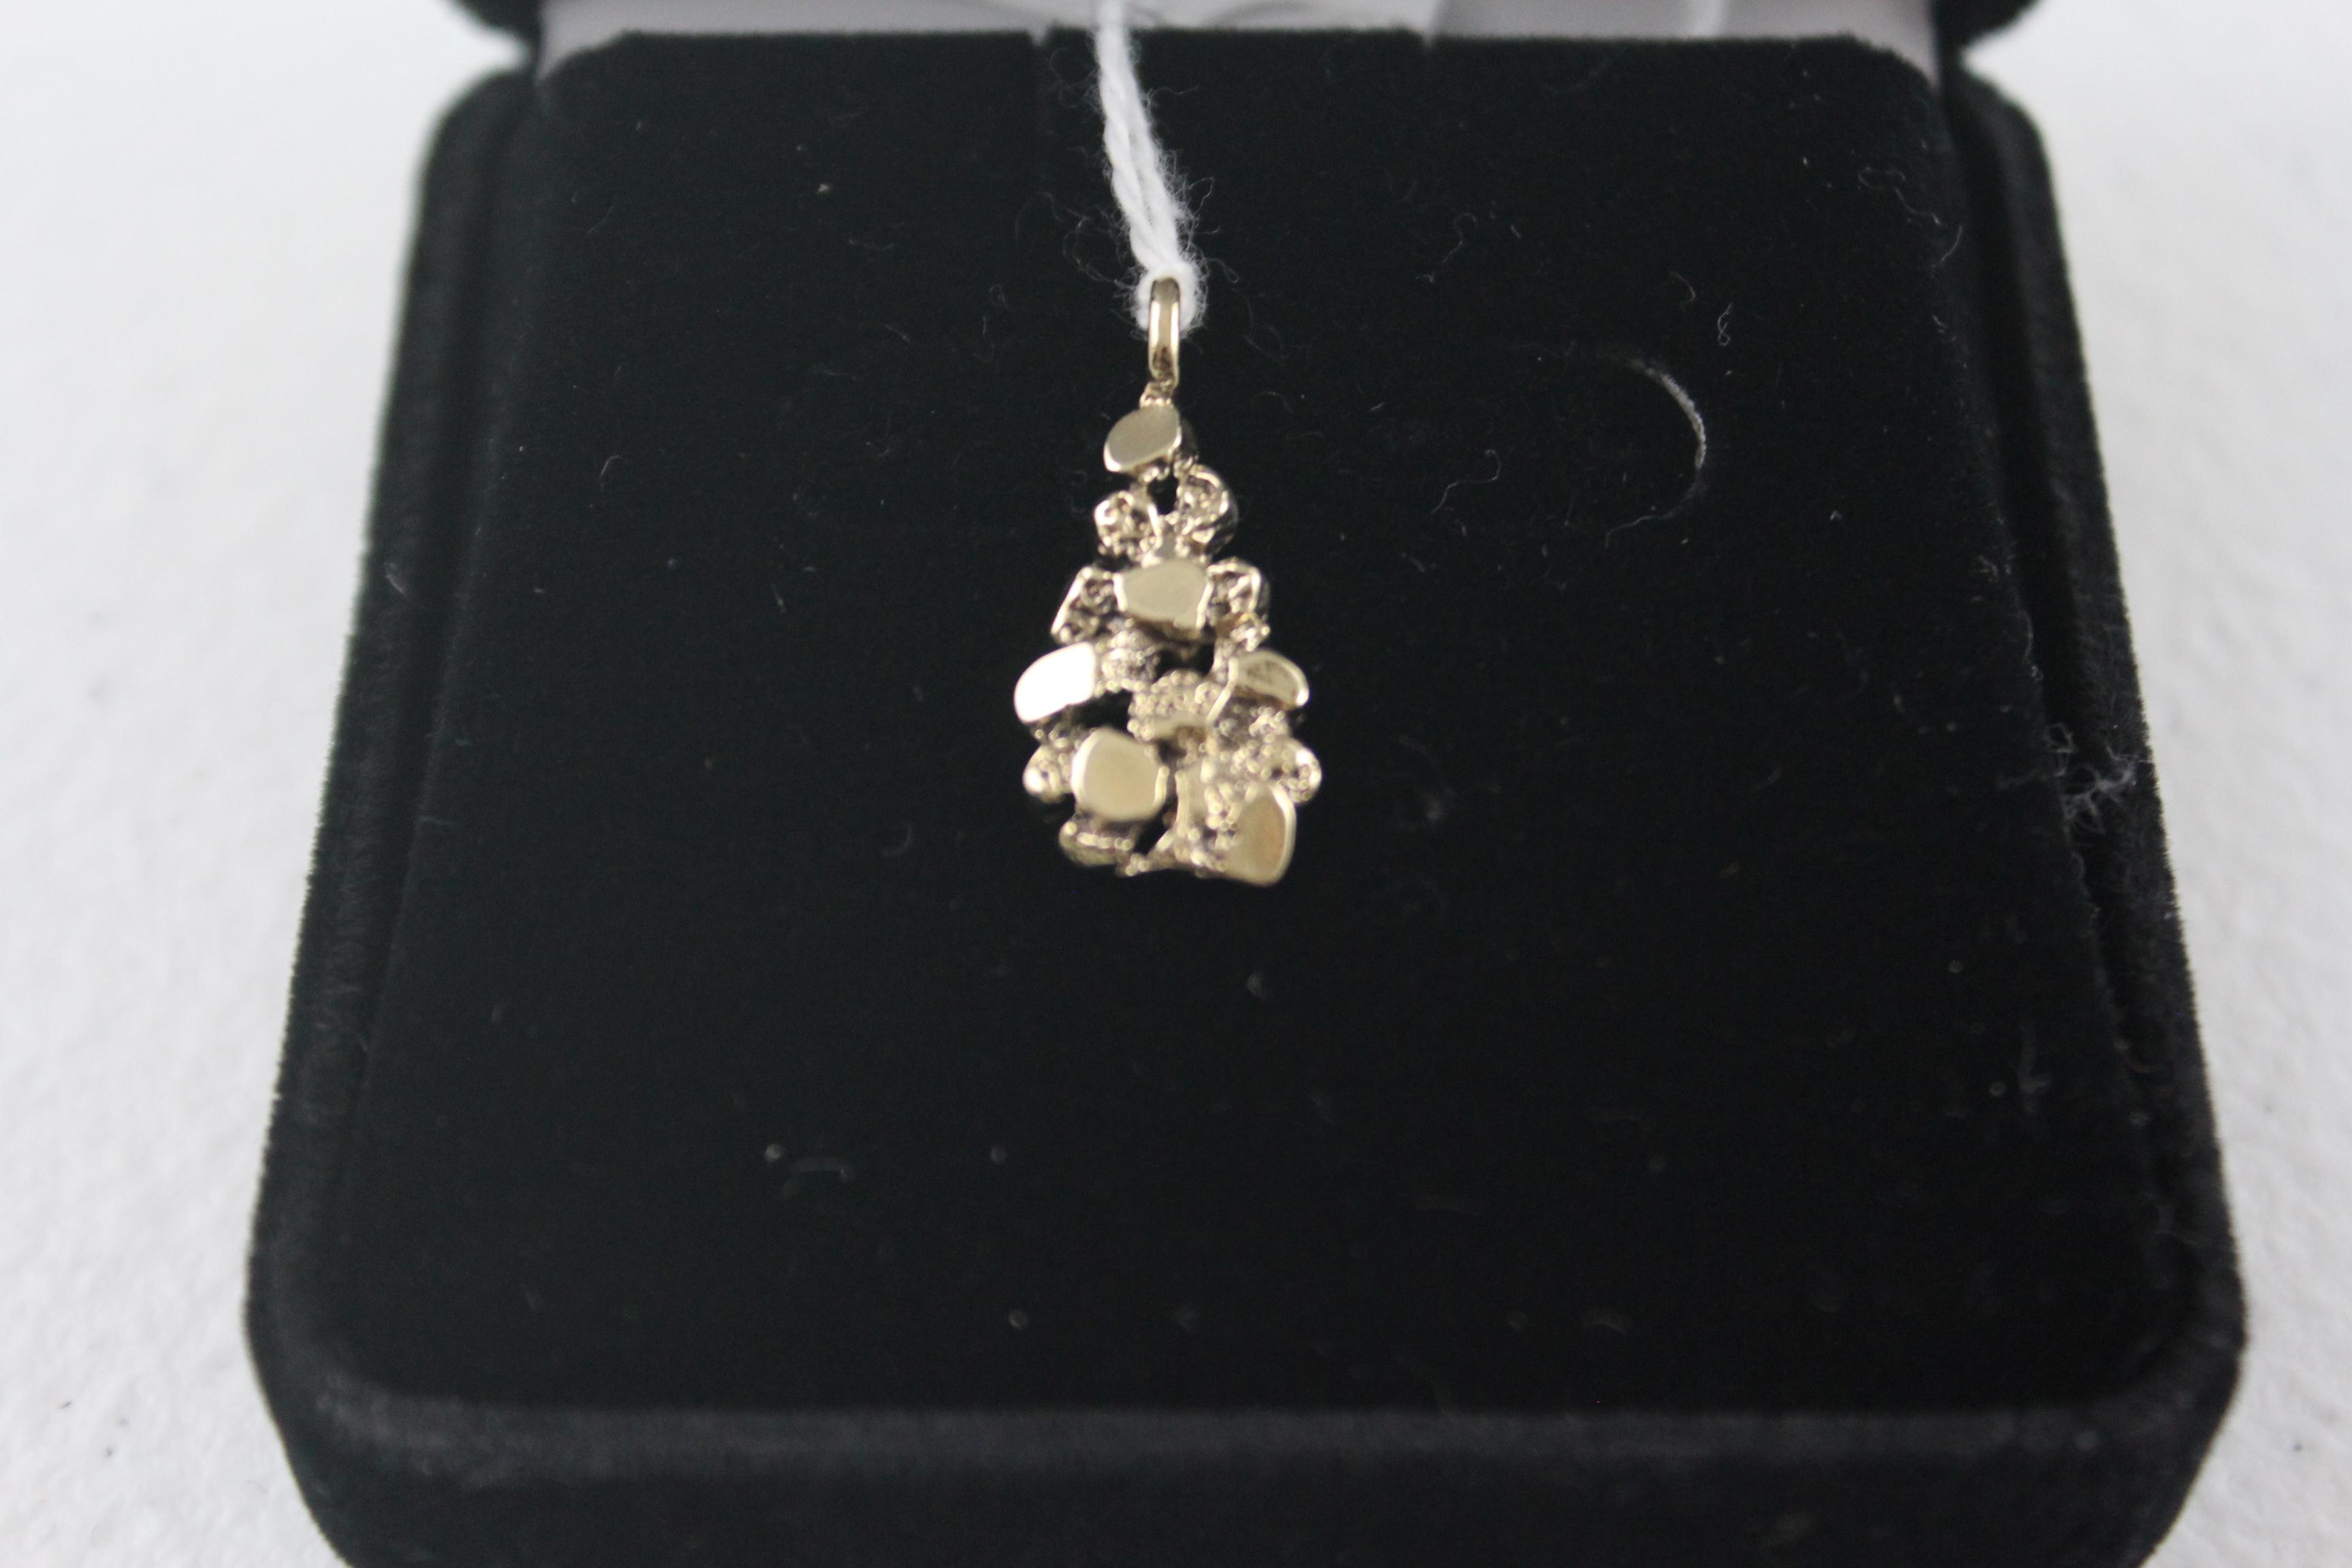 10K Yellow Gold Nugget Pendant